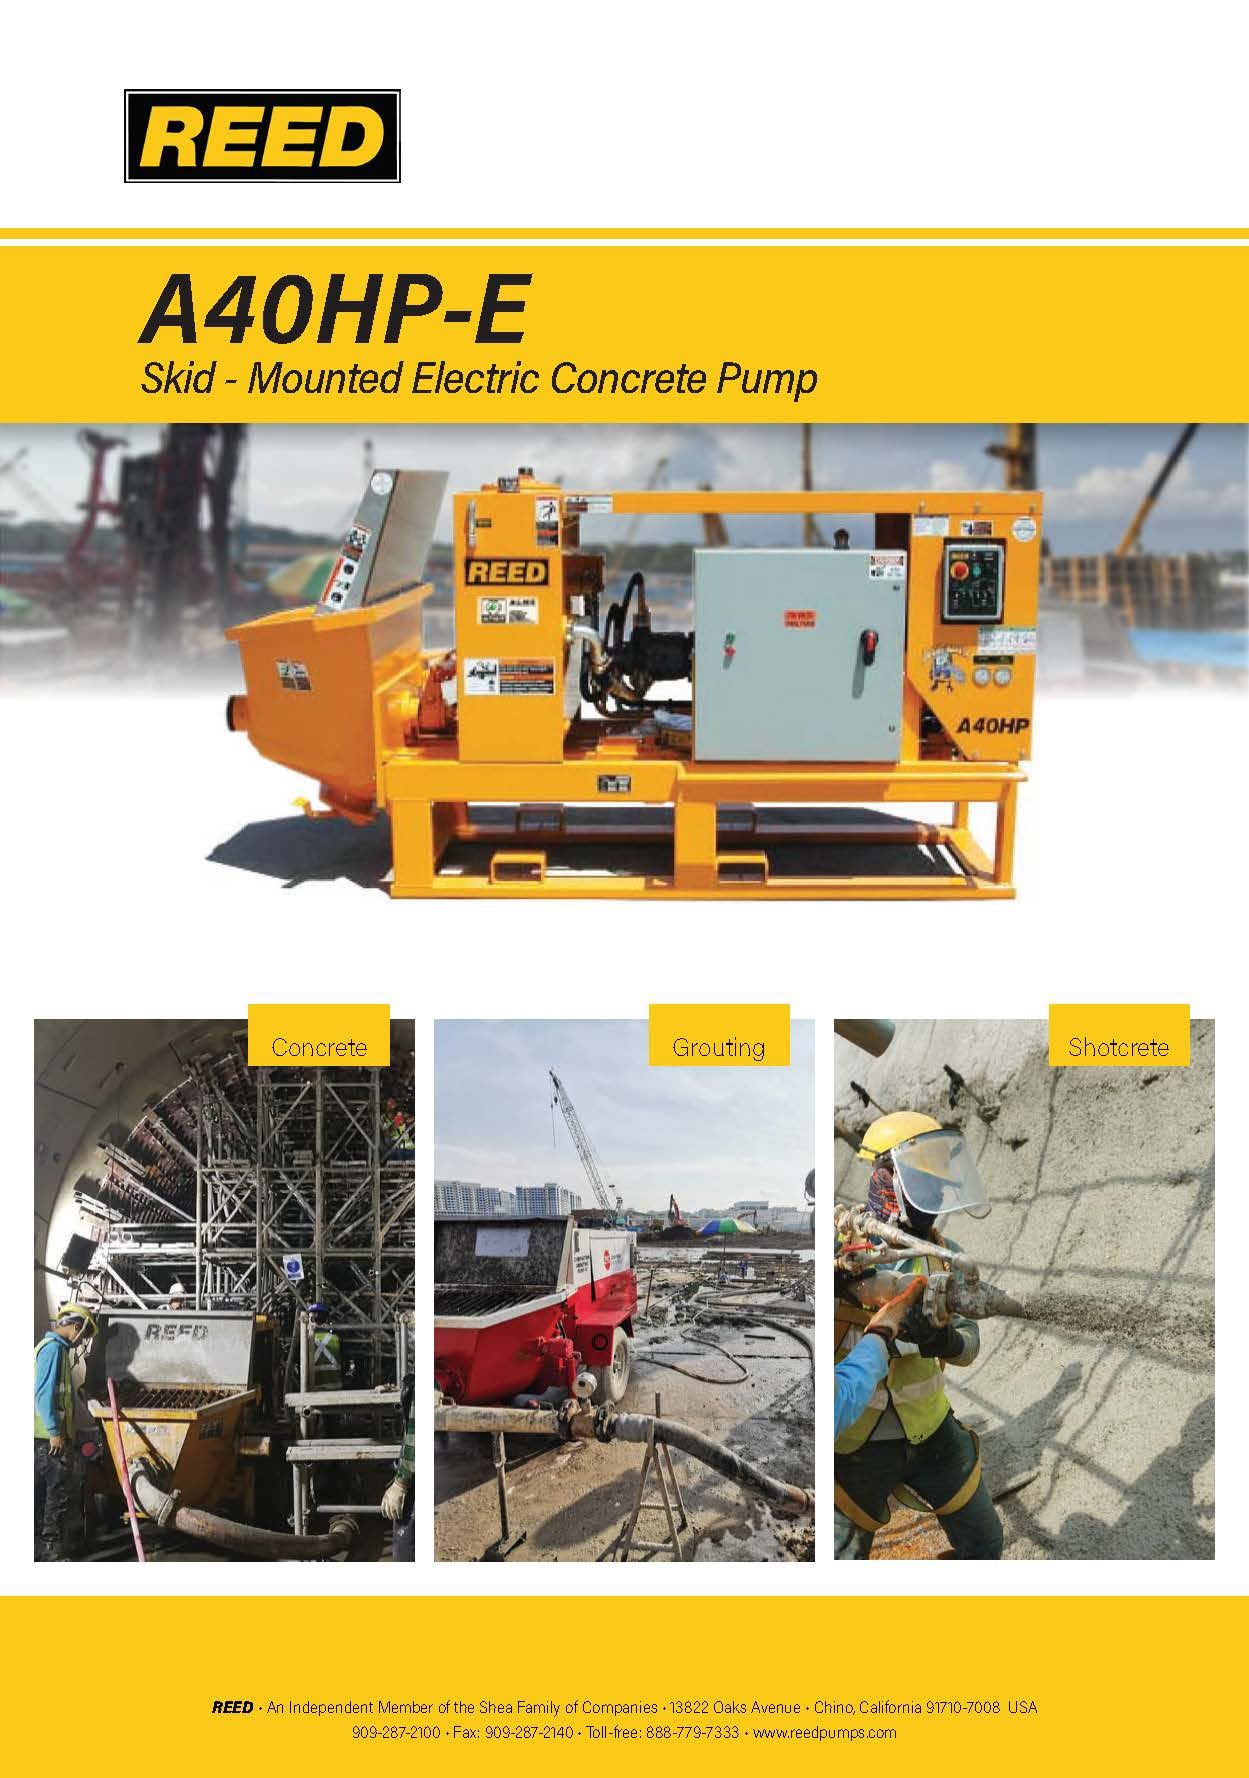 REED A40HP-E Brochure